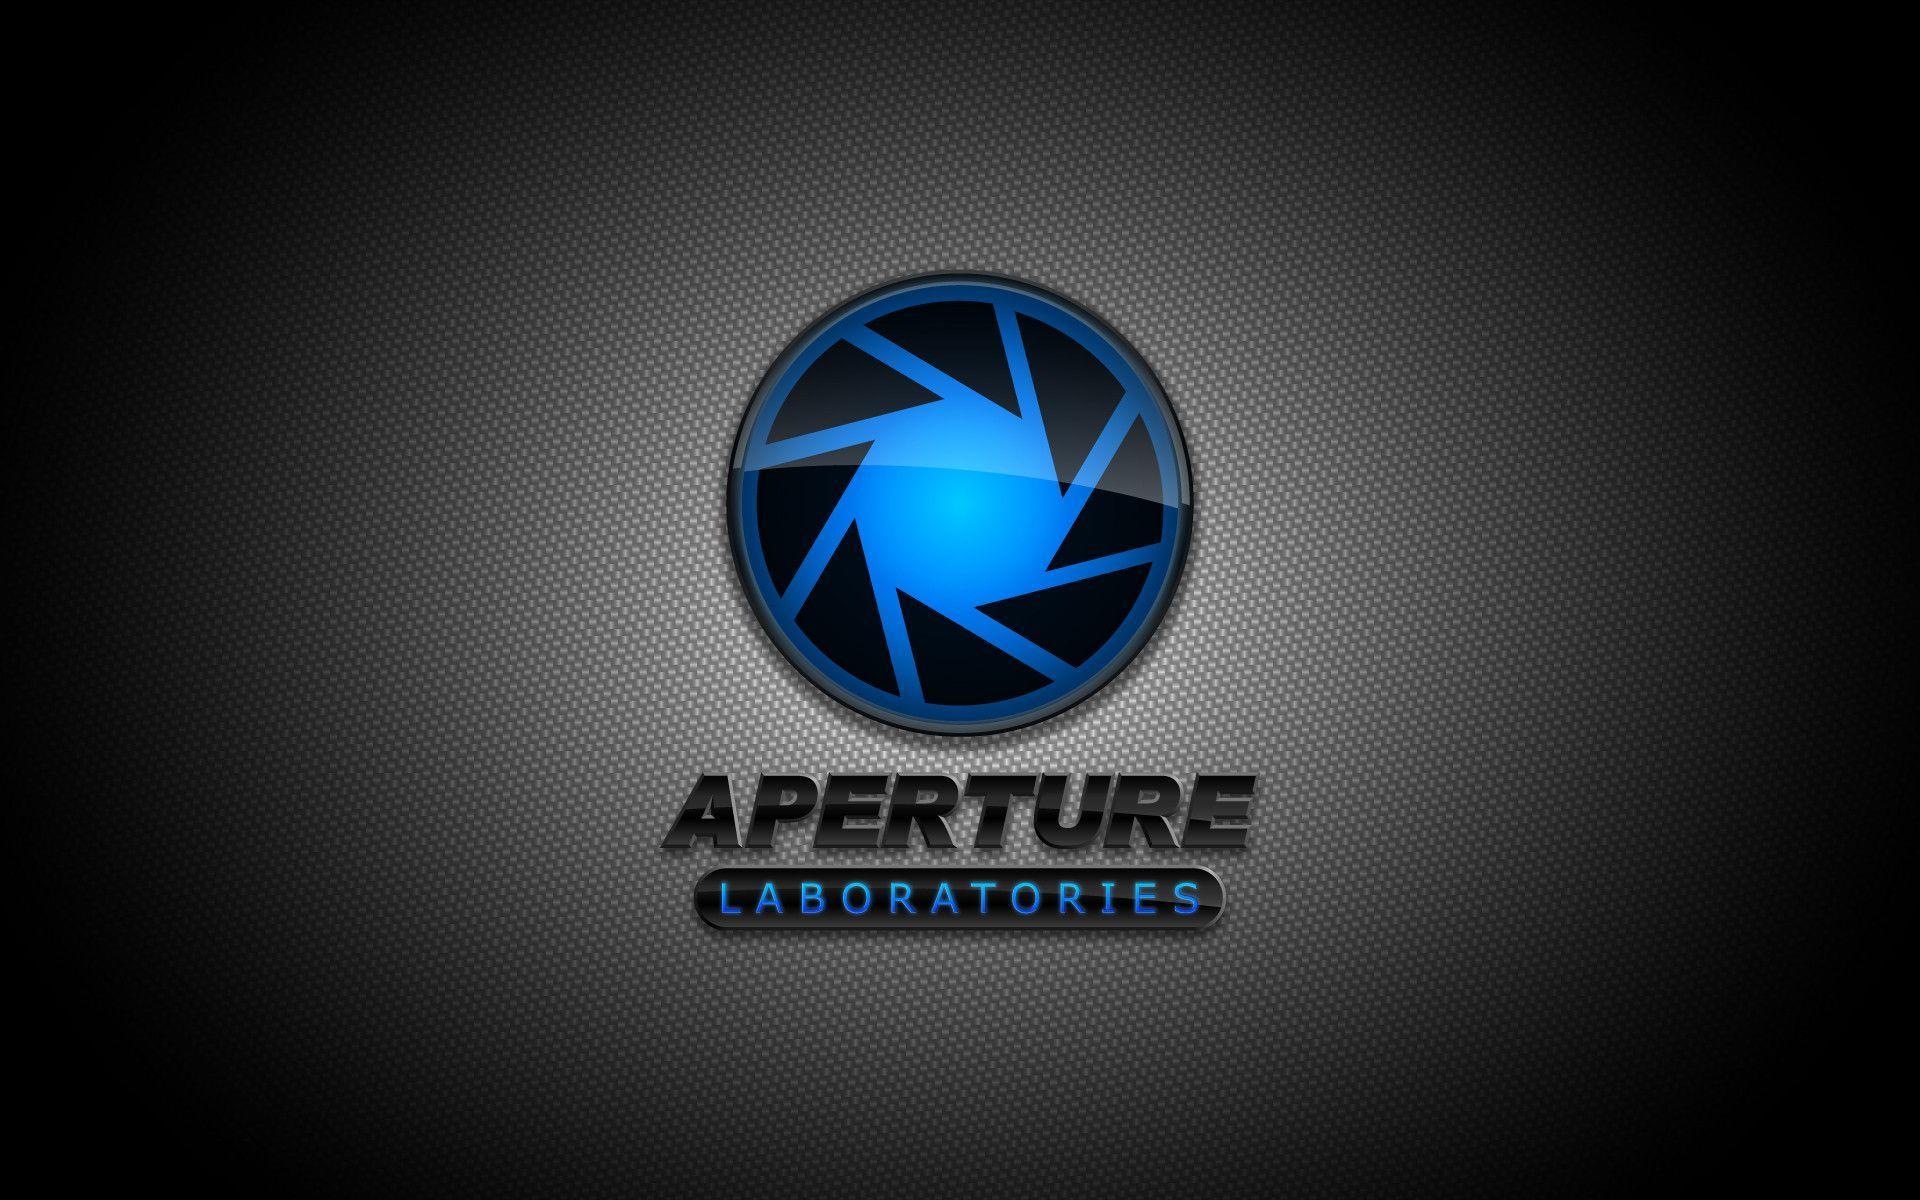 Aperture Science Logo Wallpaper